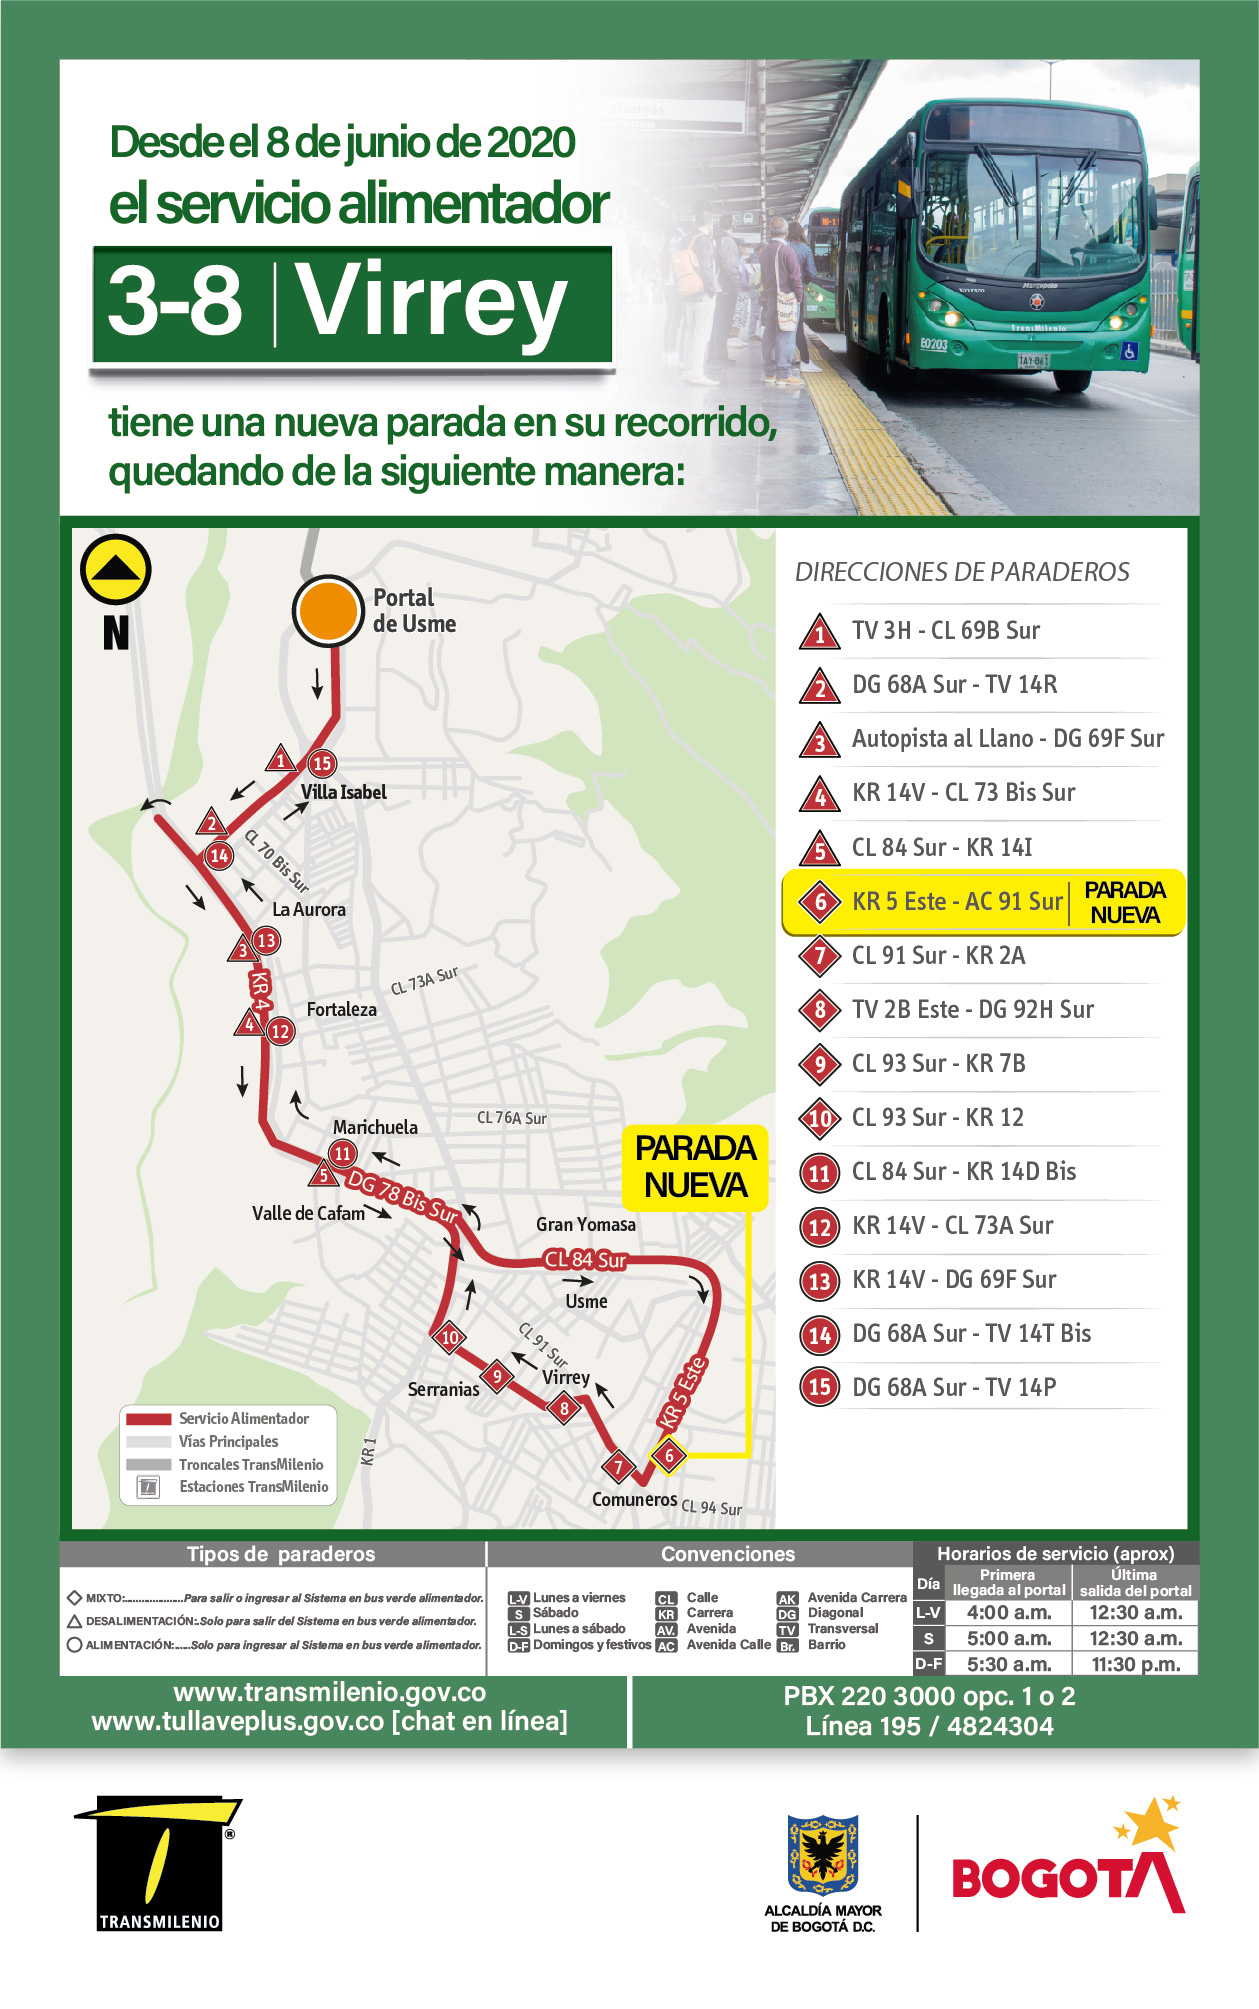 Mapa de la ruta alimentadora 3-8 Virrey